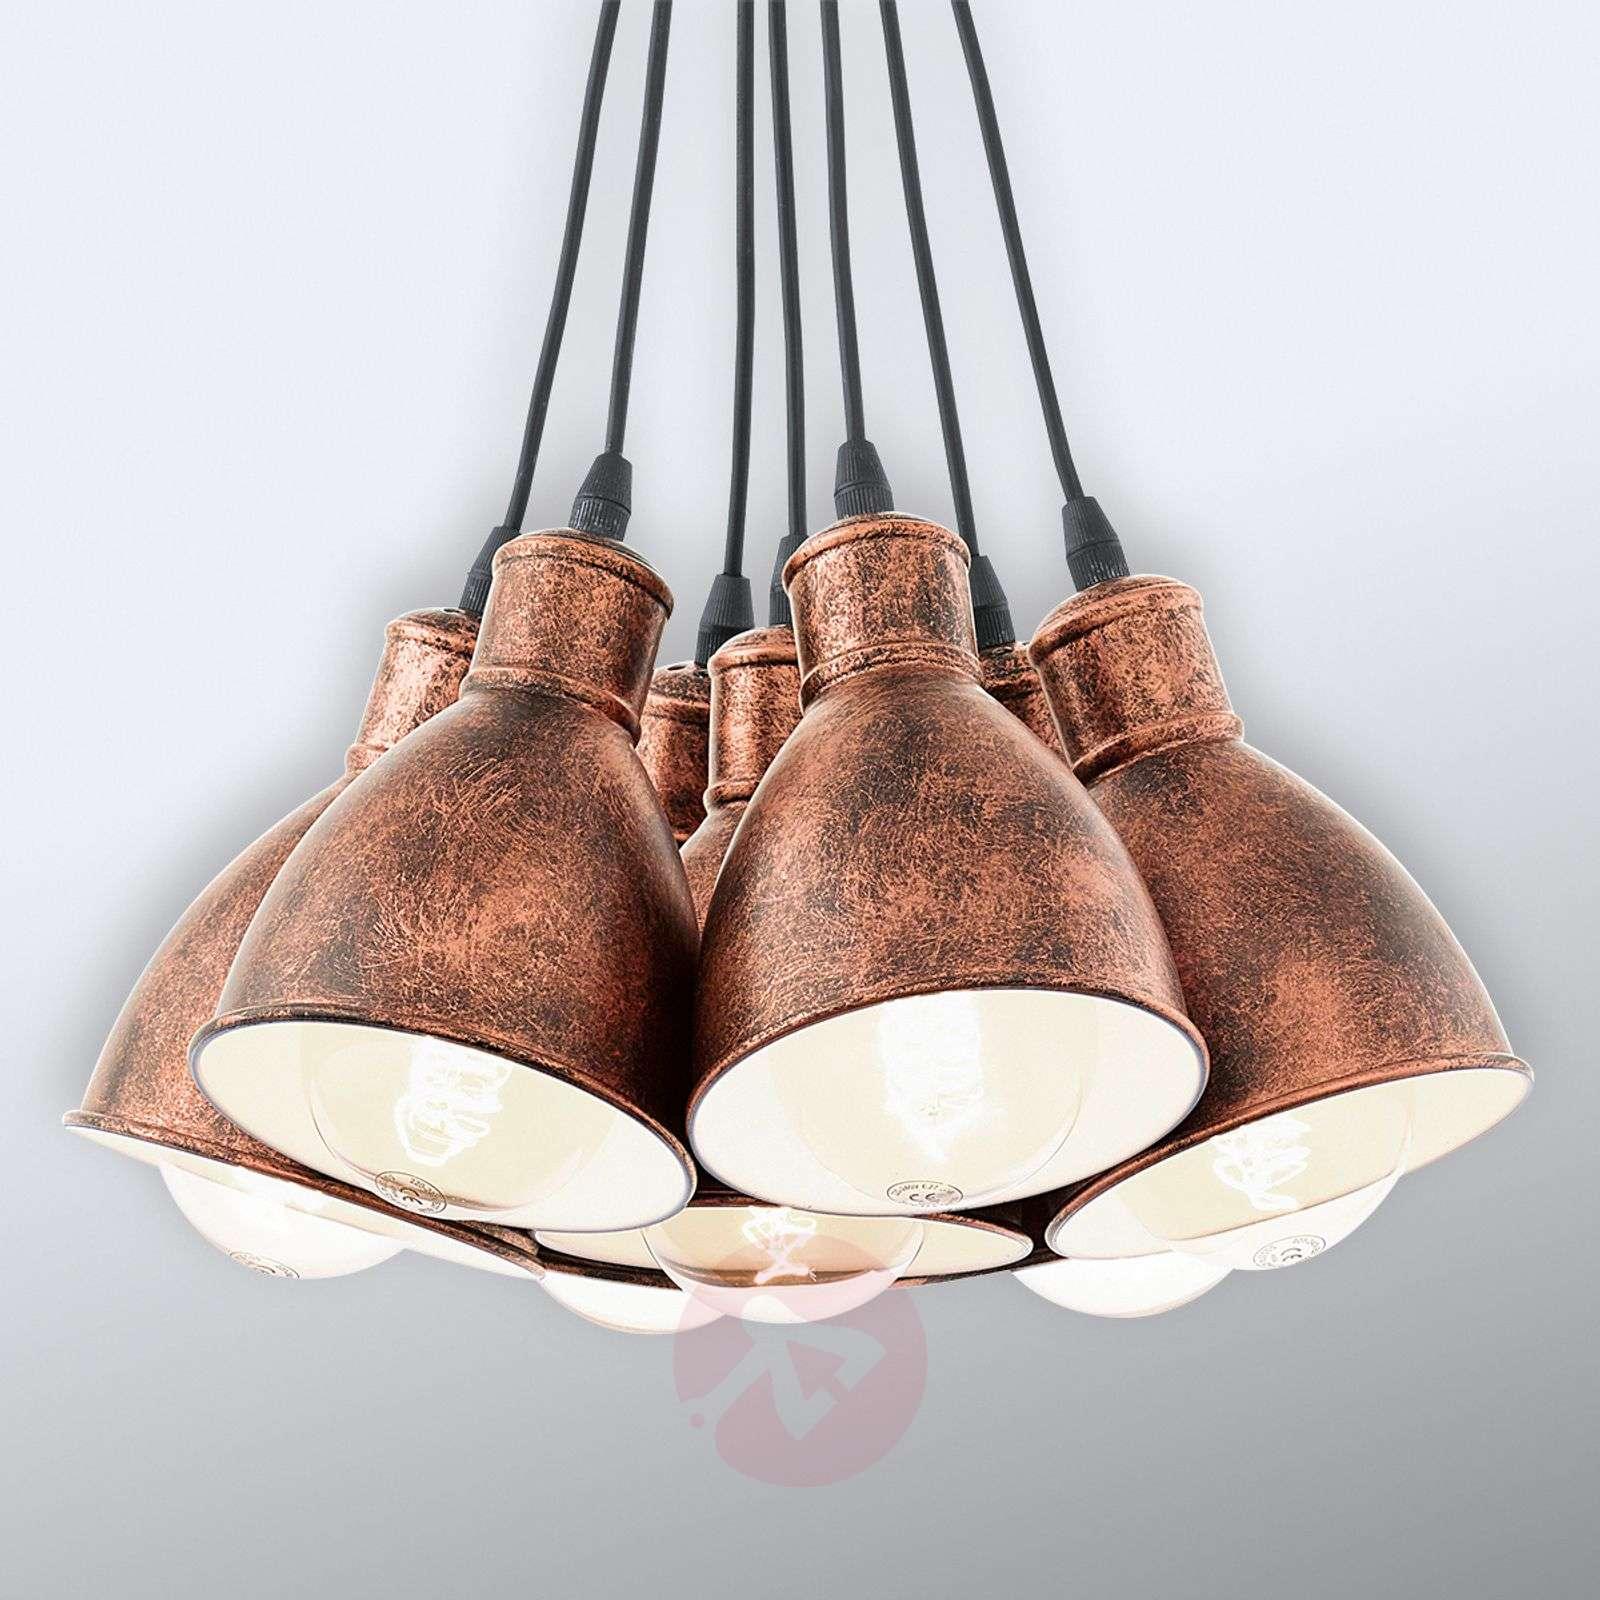 Pendant light Priddy 1, seven-bulb, antique copper-3031785-01